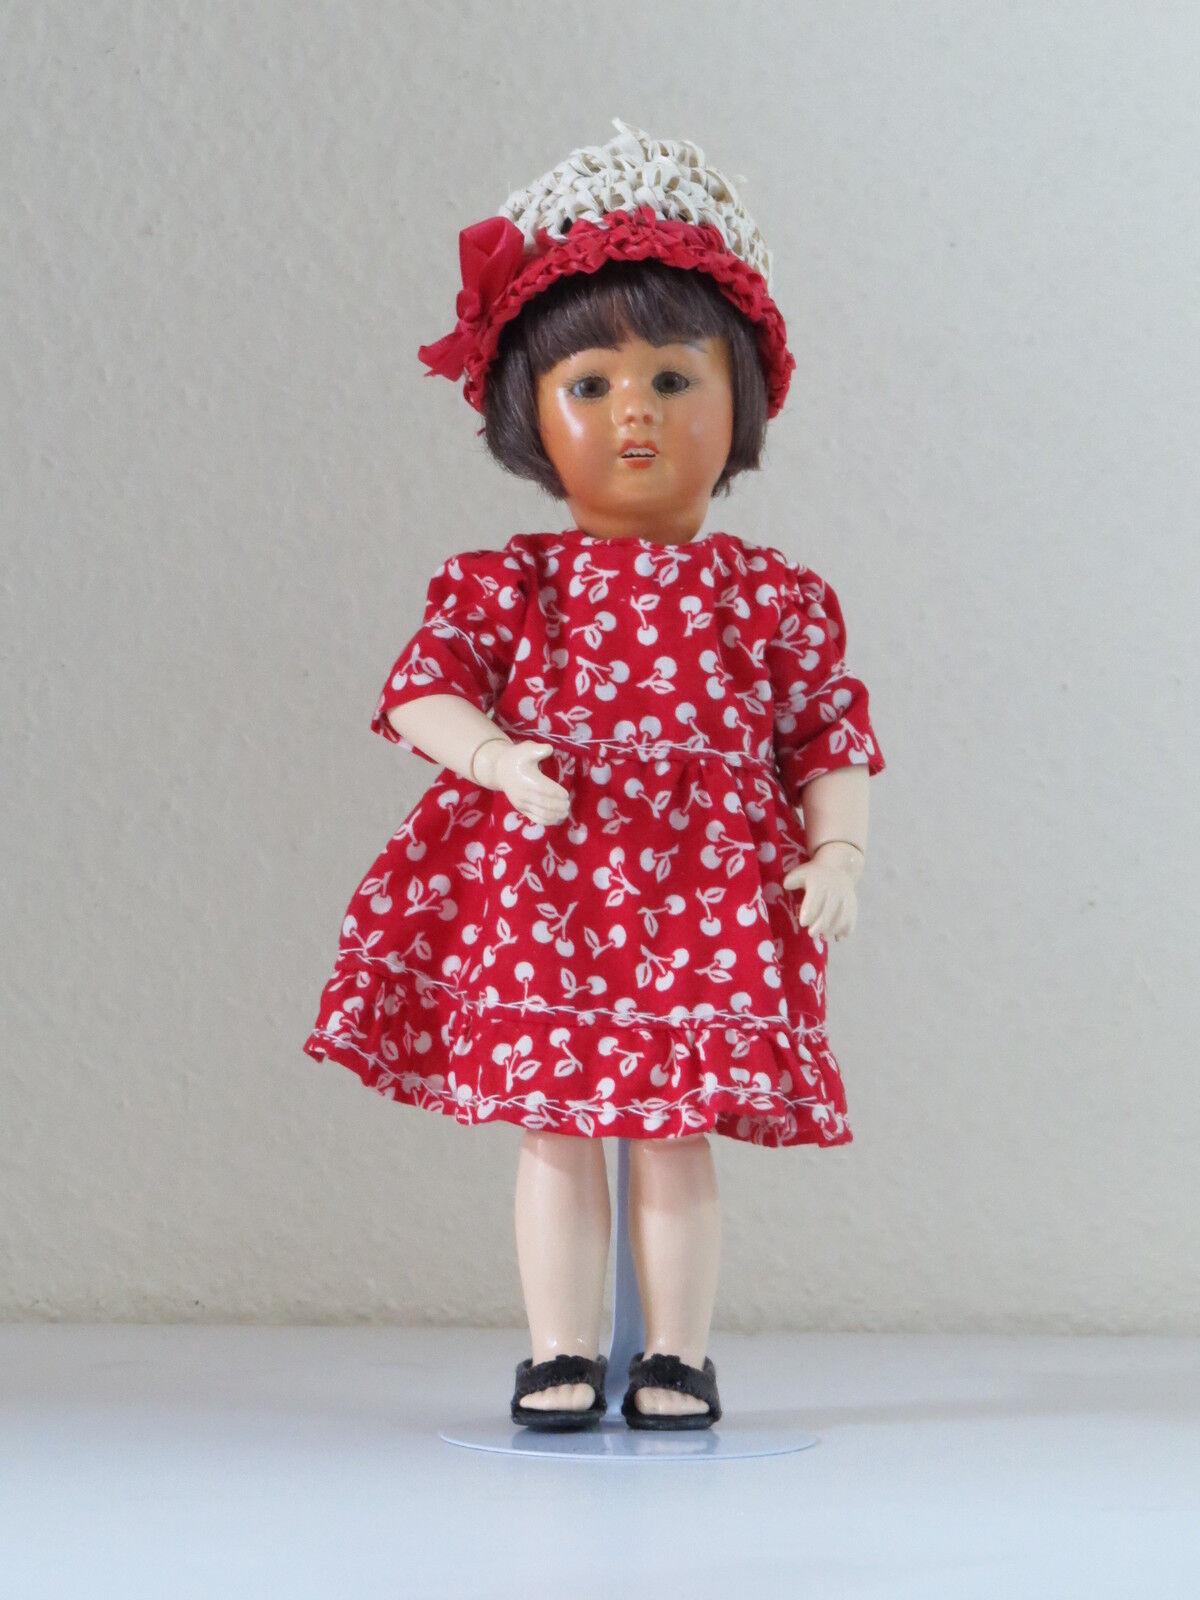 Loulotte  Un poco Asiática Nº 8 . 24 cm Muñeca creacióN Doll Asia